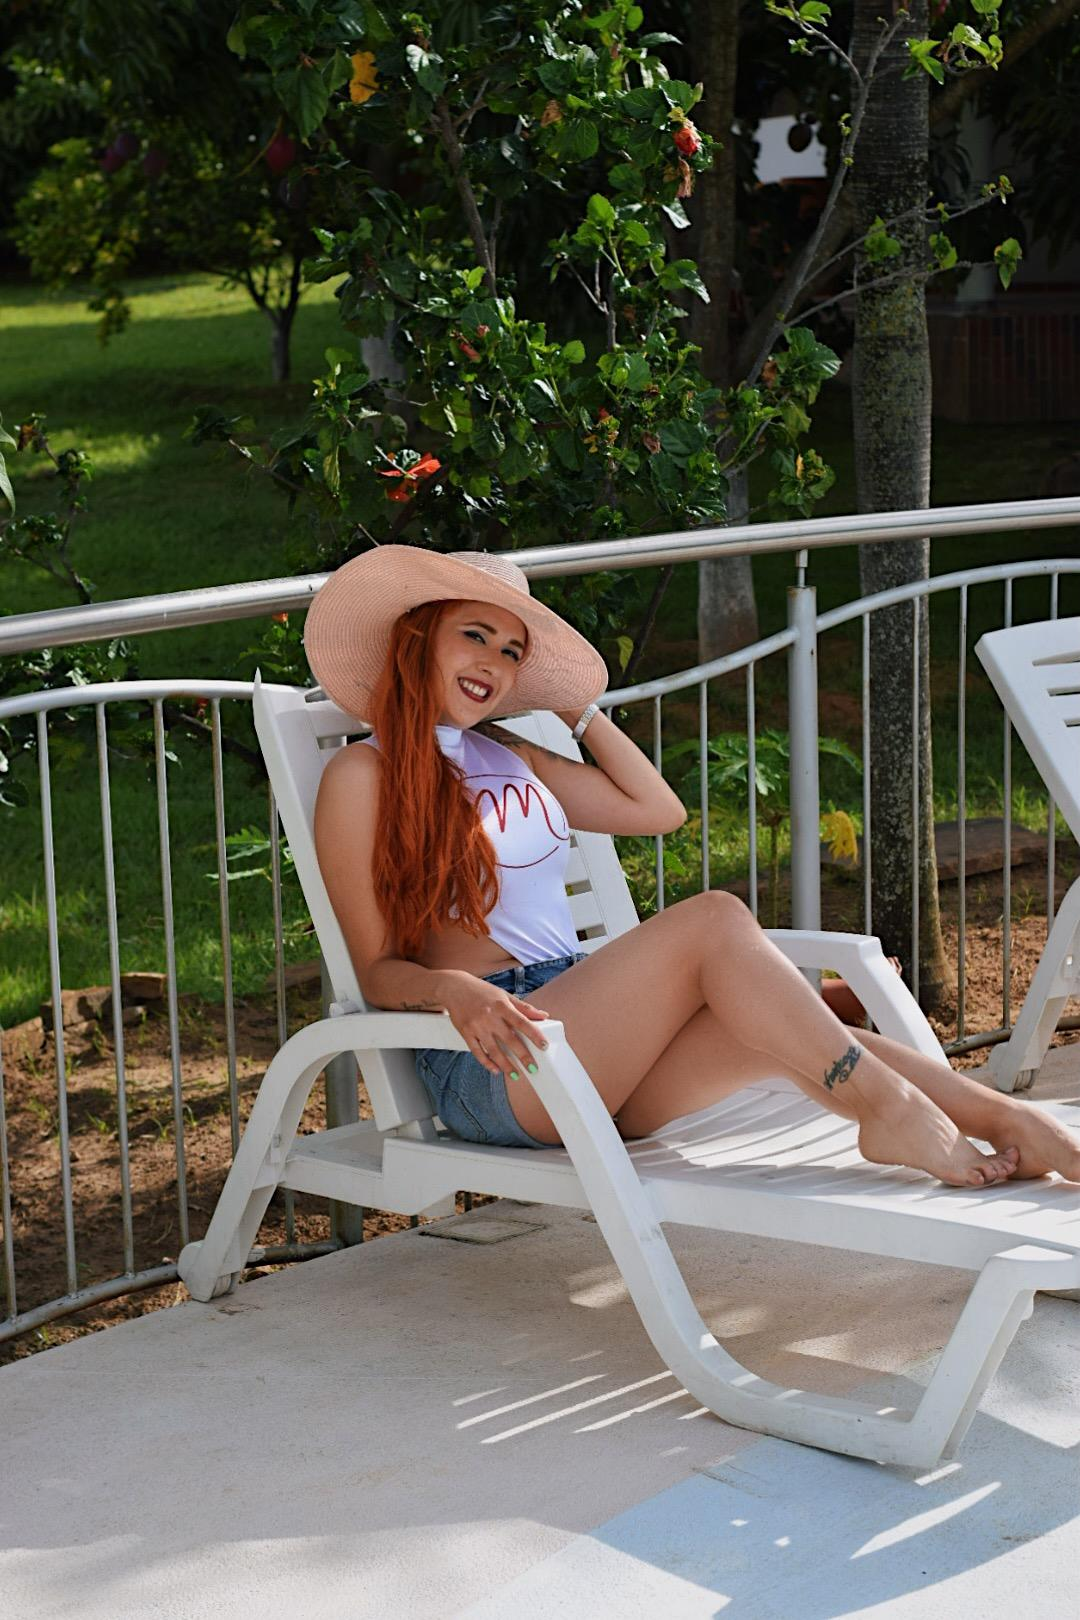 Carla luxury ?s=1spny8xhll2cdviv8snhdqfp32knanmblbcocmiiirk=